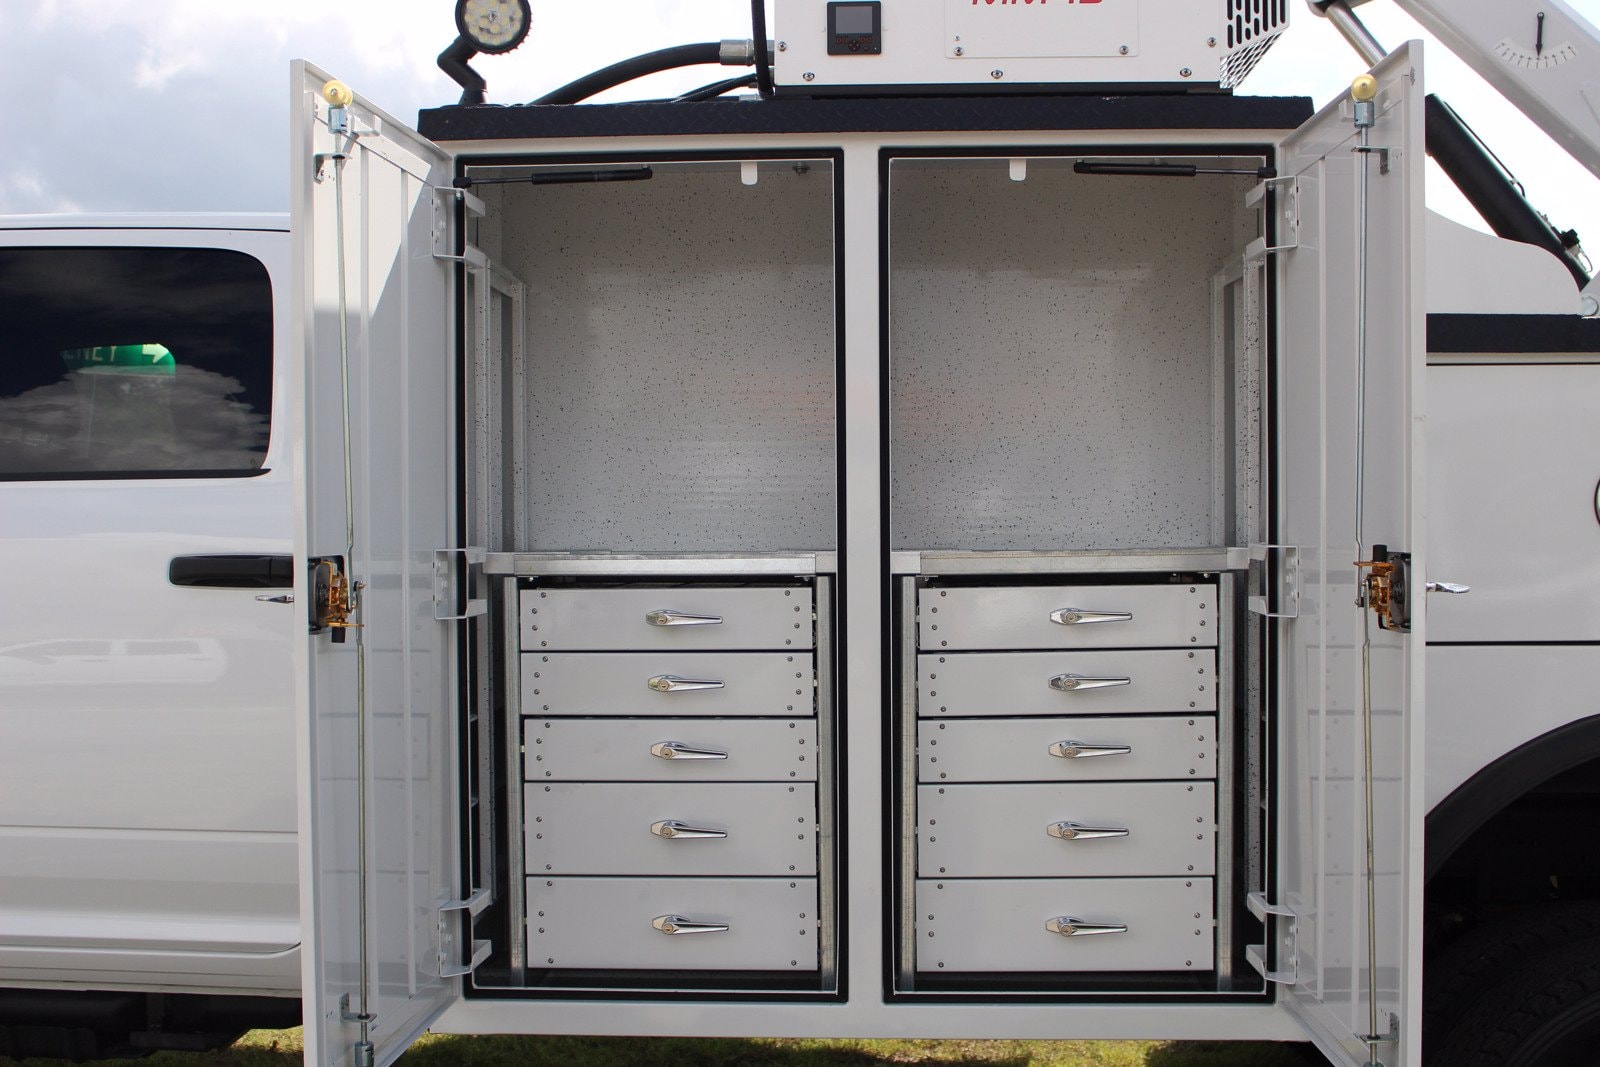 2020 Ram 5500 Crew Cab DRW 4x4, Reading Master Mechanic HD Crane Service Body #TG130027 - photo 4